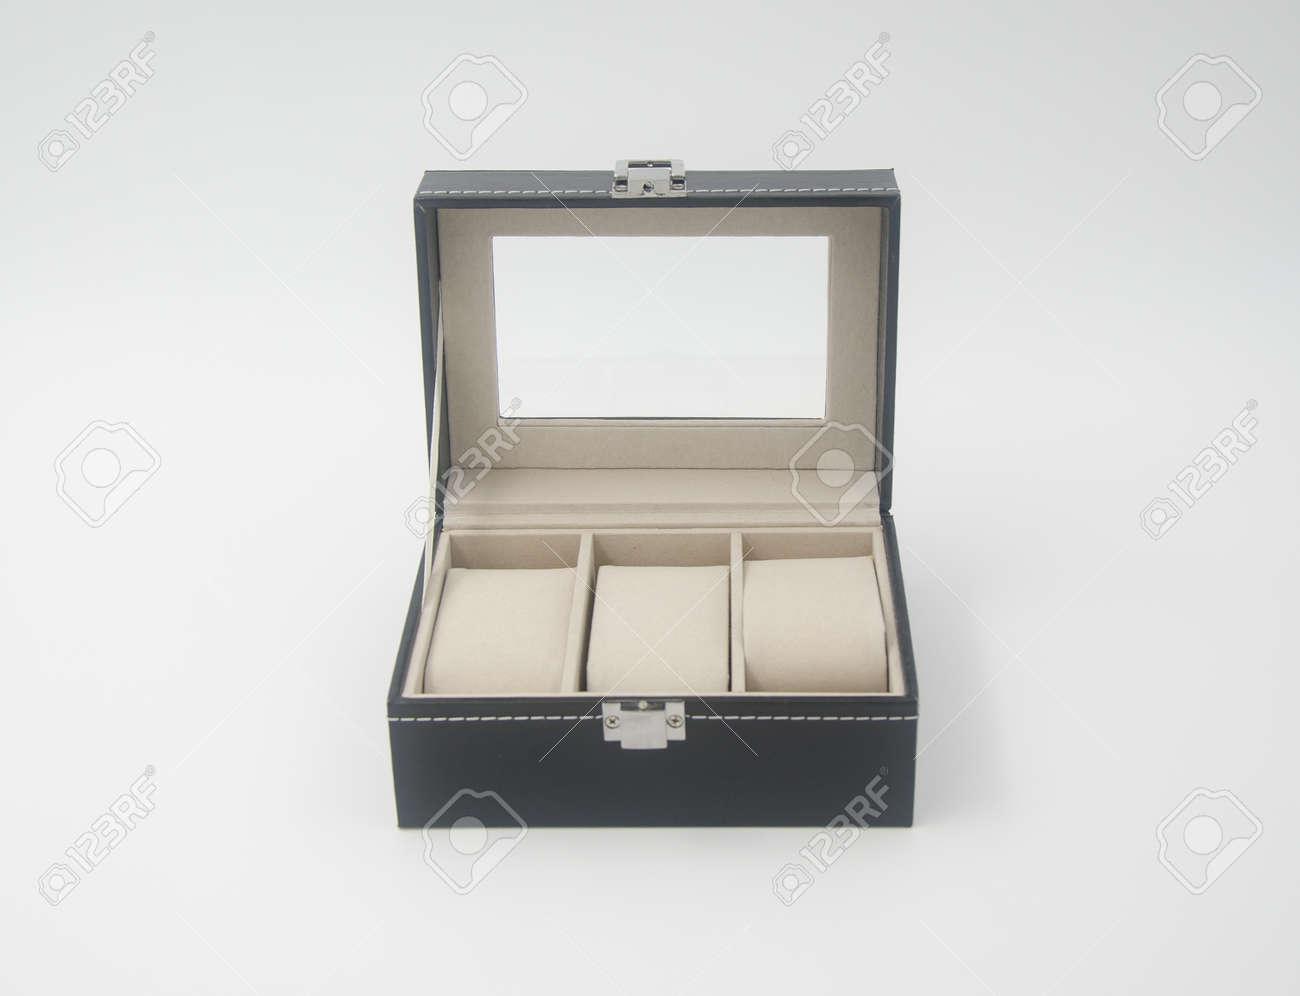 Jewelry Box Or Black Leather Jewelery Box On Background